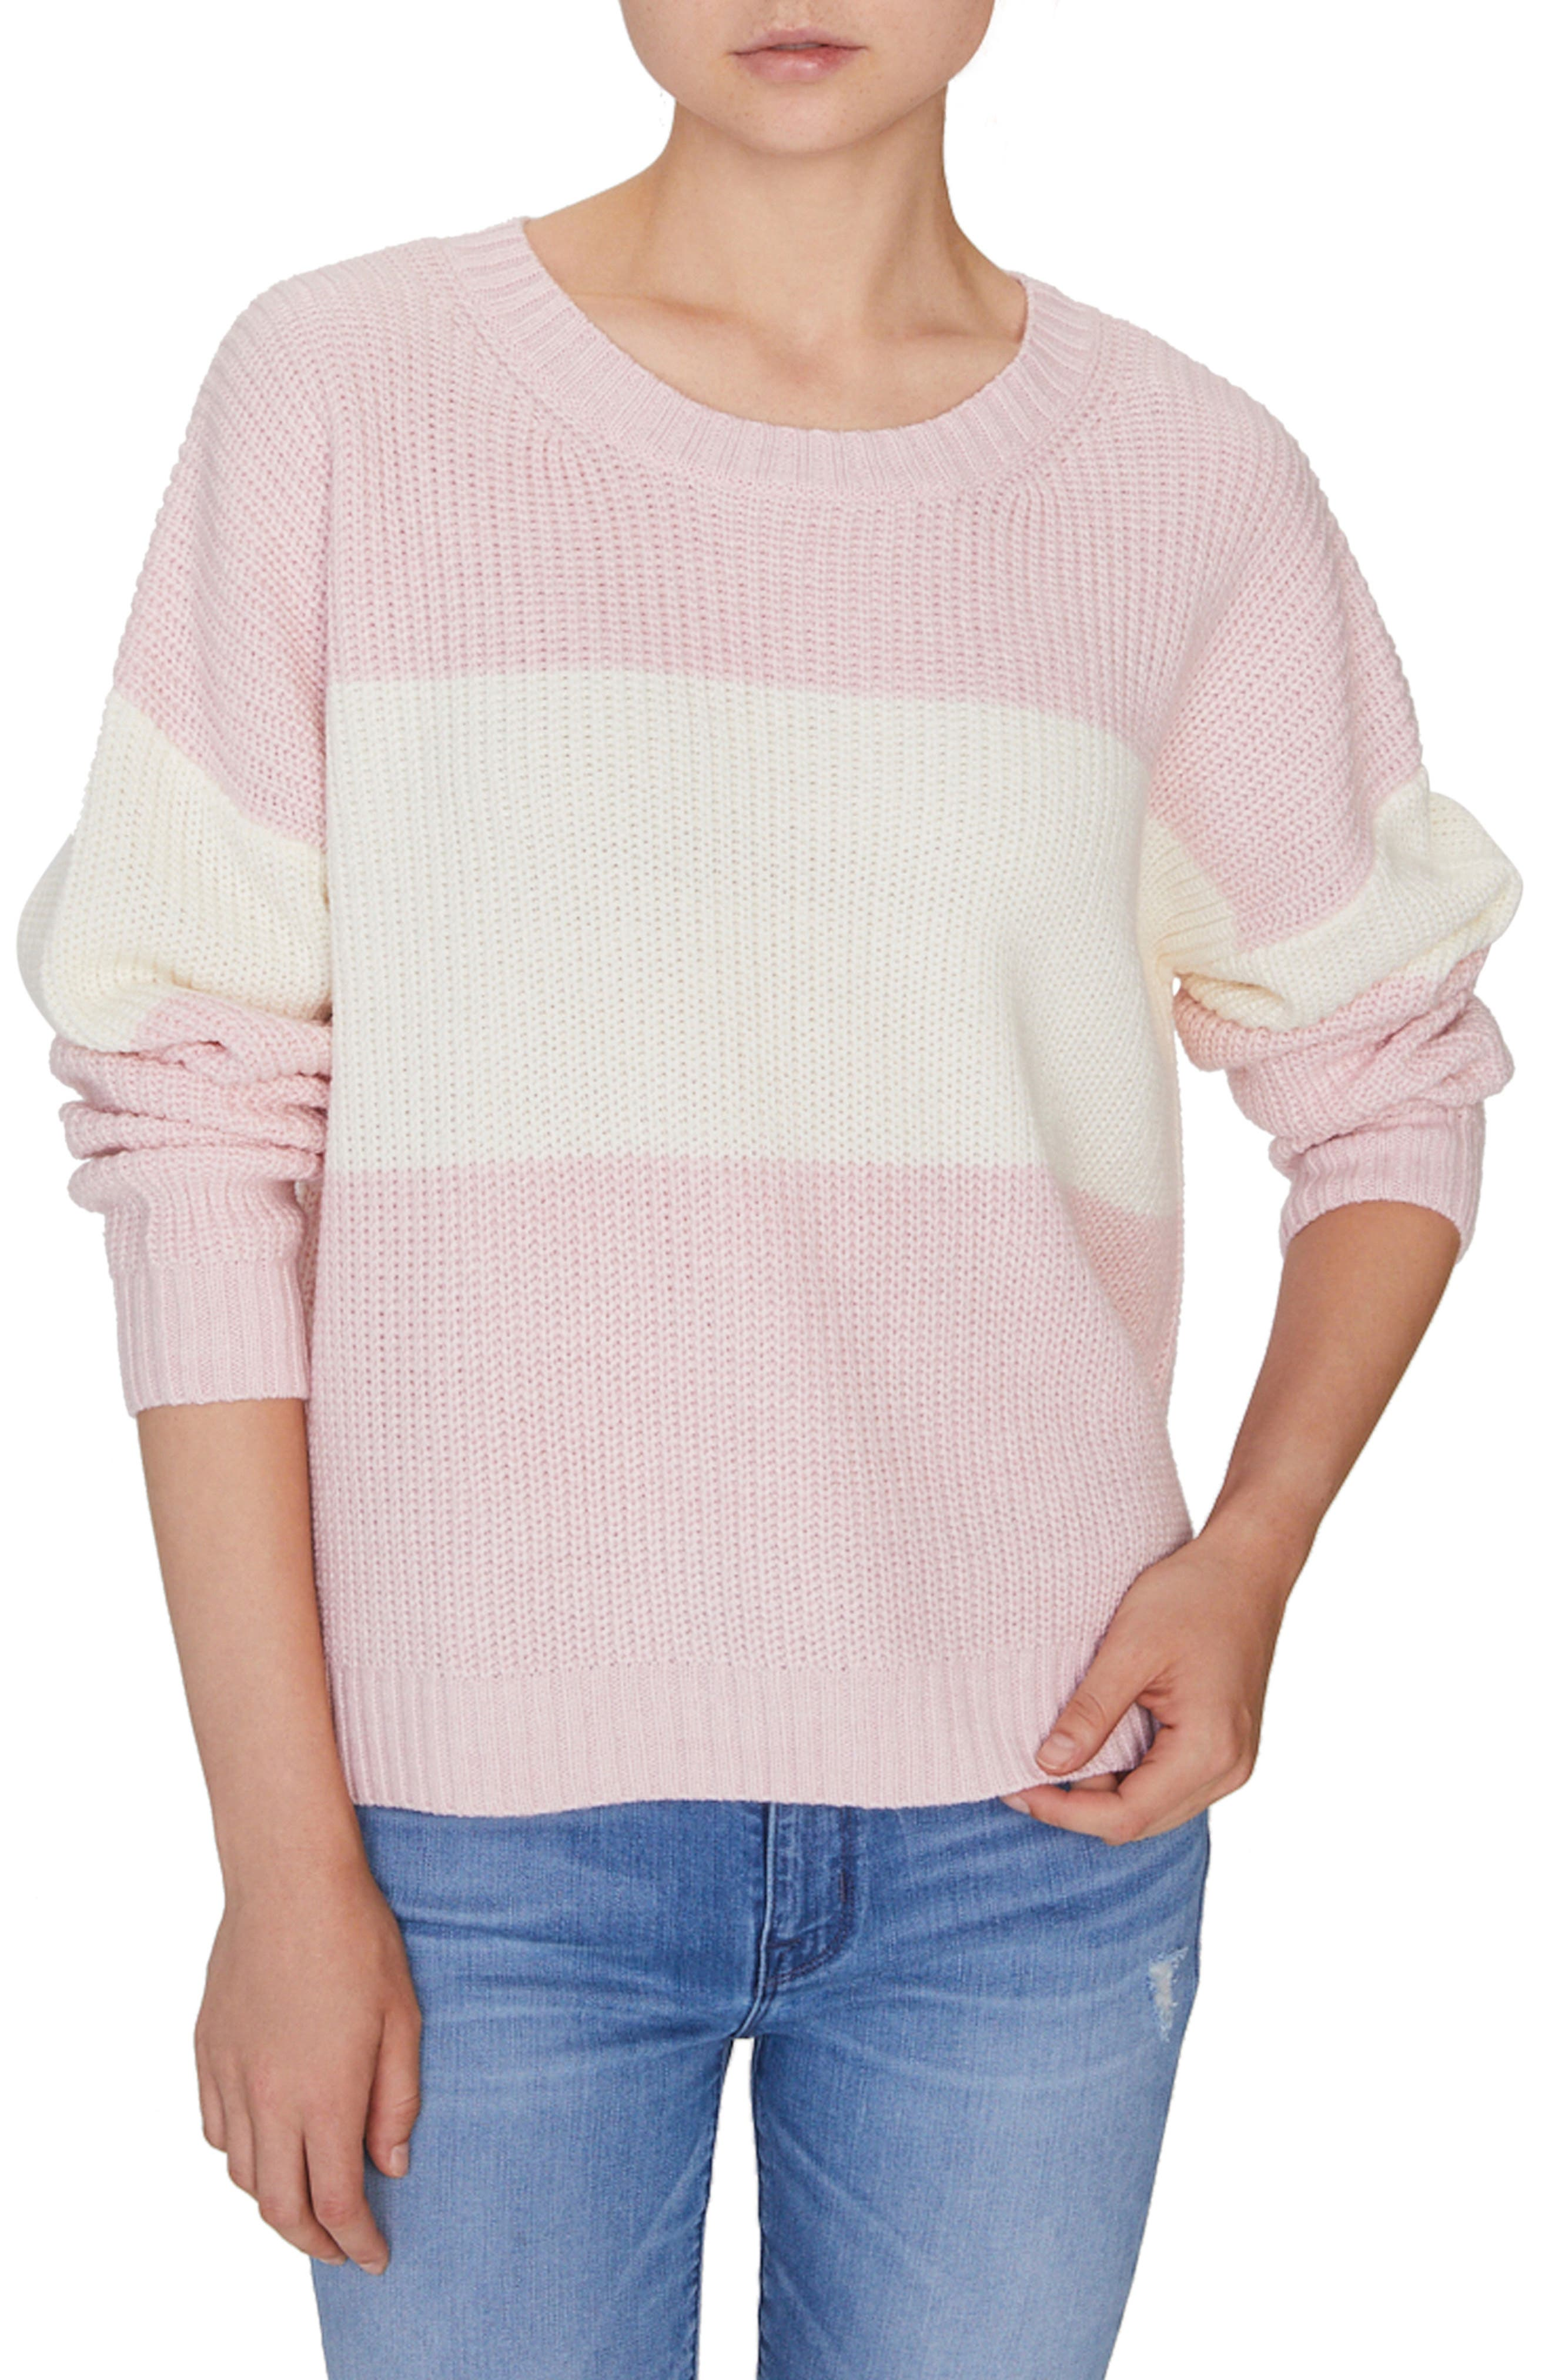 SANCTUARY Billie Colorblock Shaker Sweater, Main, color, HEATHER CHERRYBLOSSOM/ NATURAL